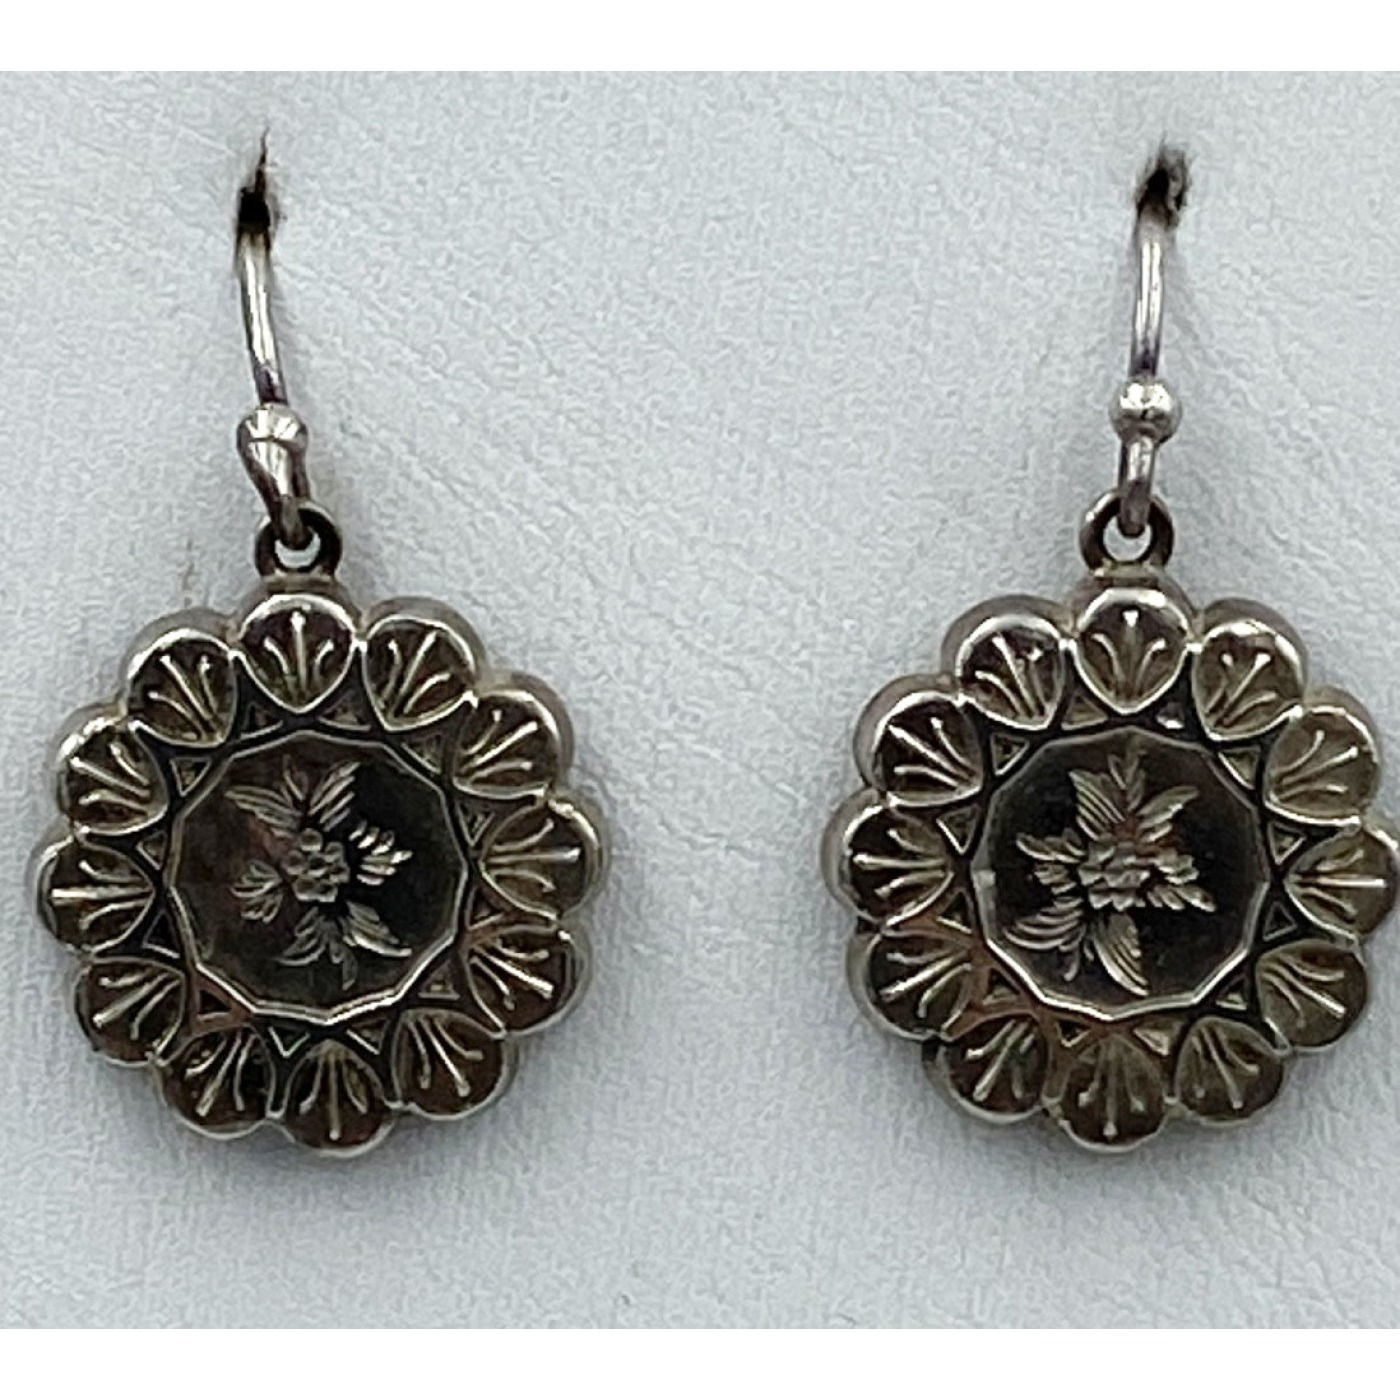 Victorian Flower Medallion Antique English Earrings